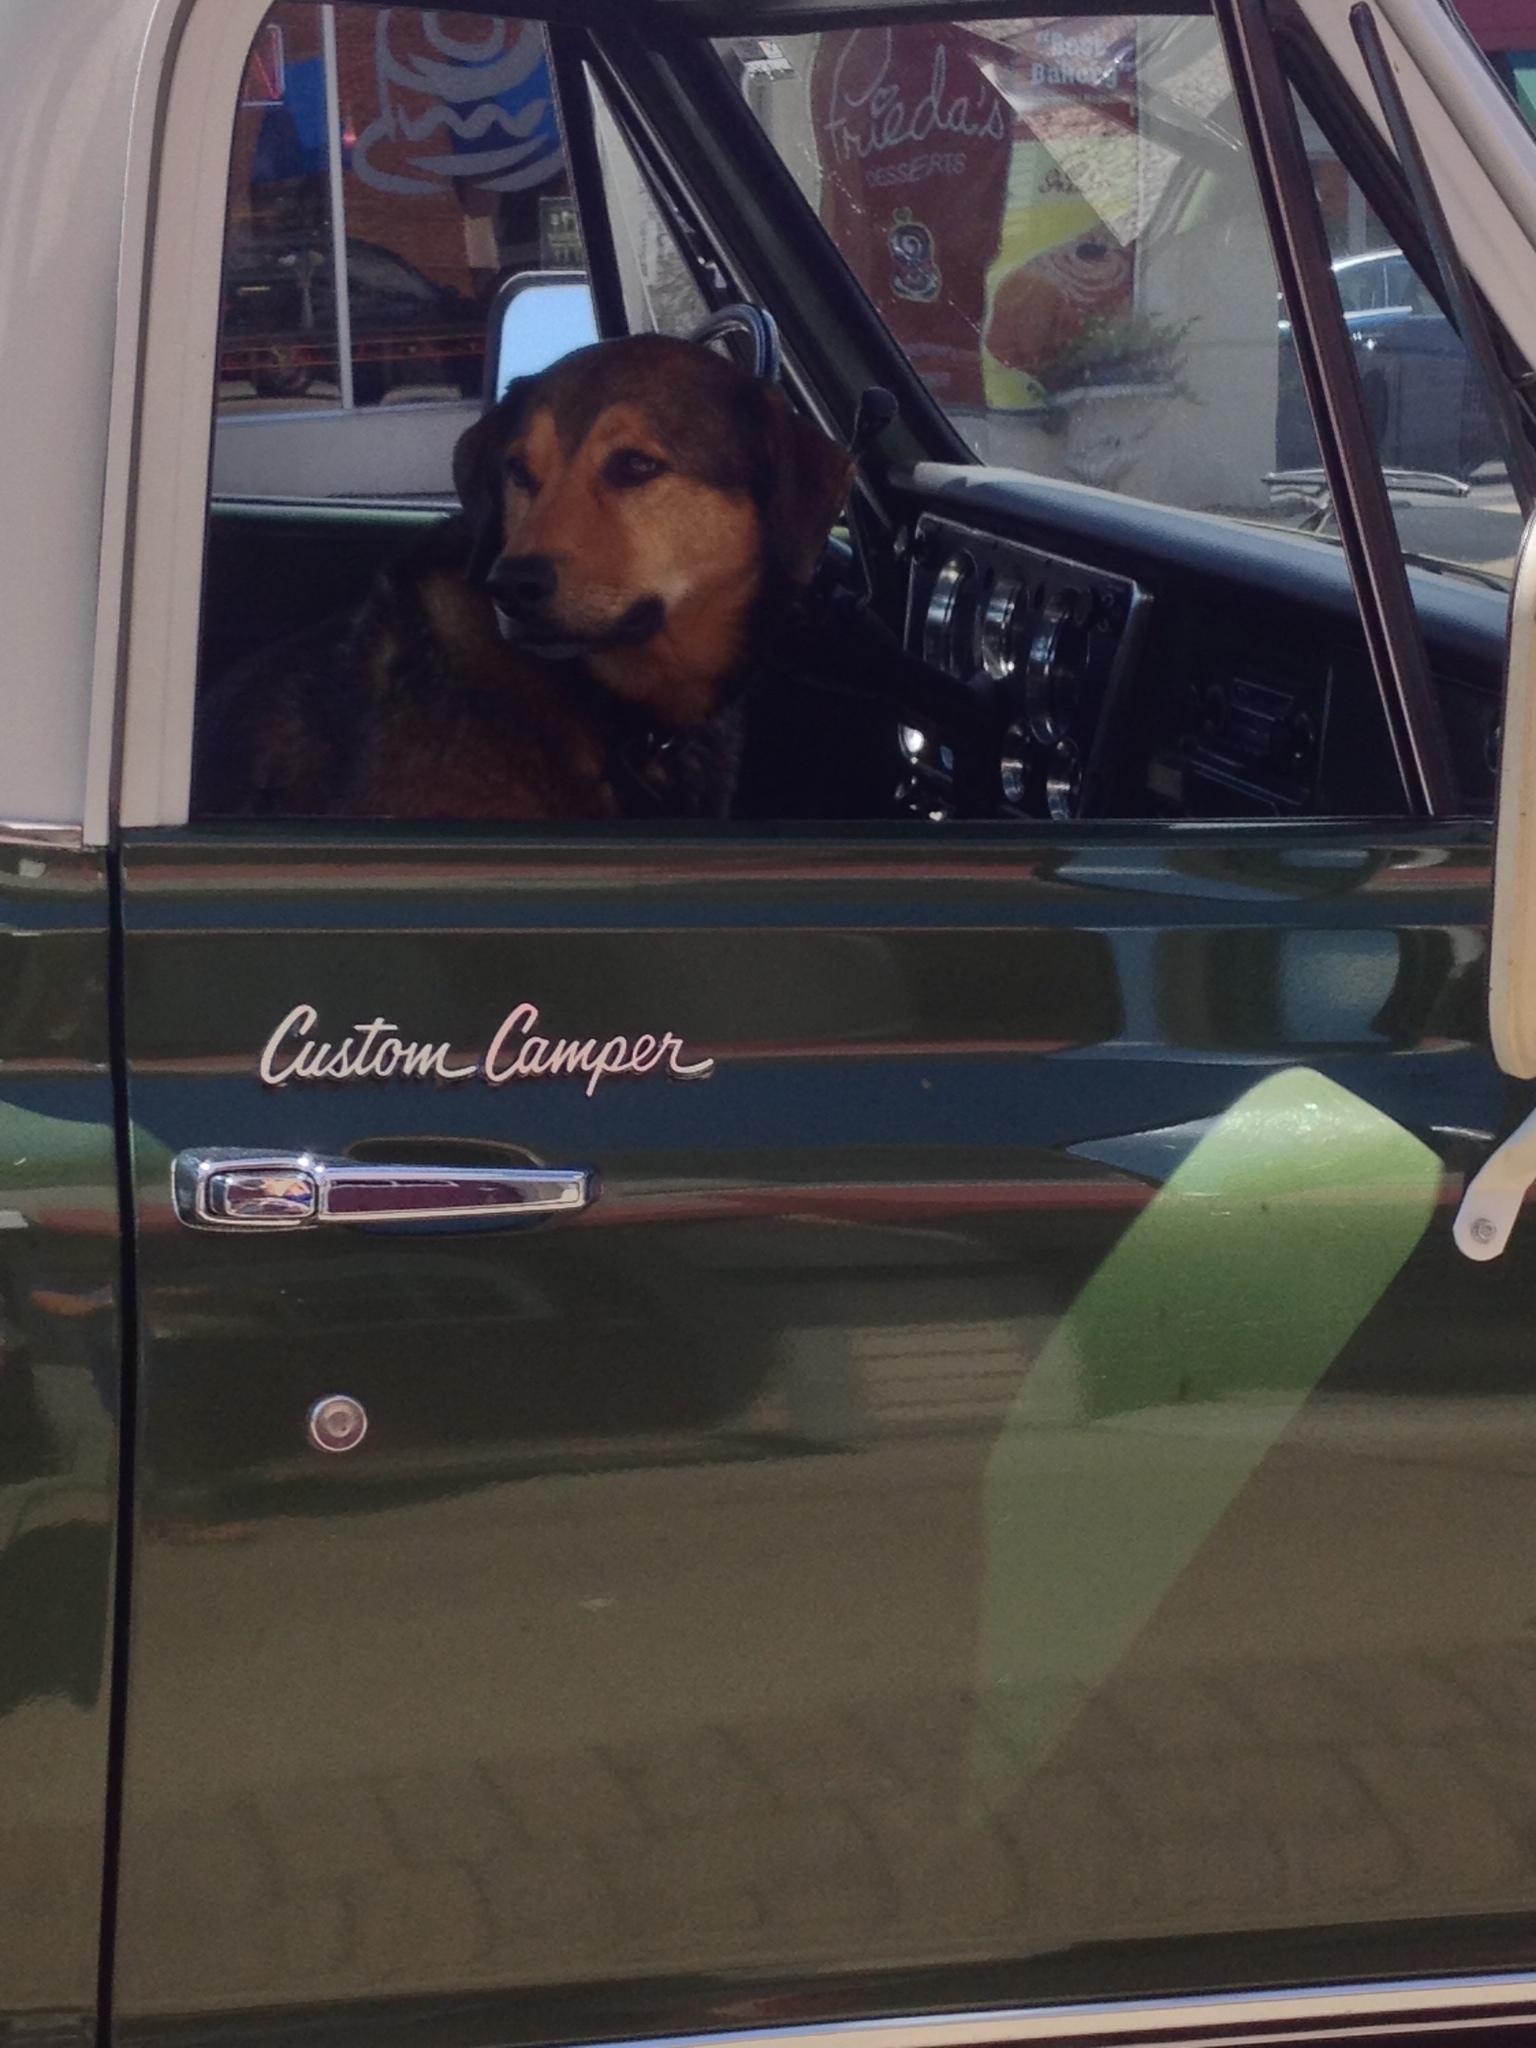 Murphy waits in the truck